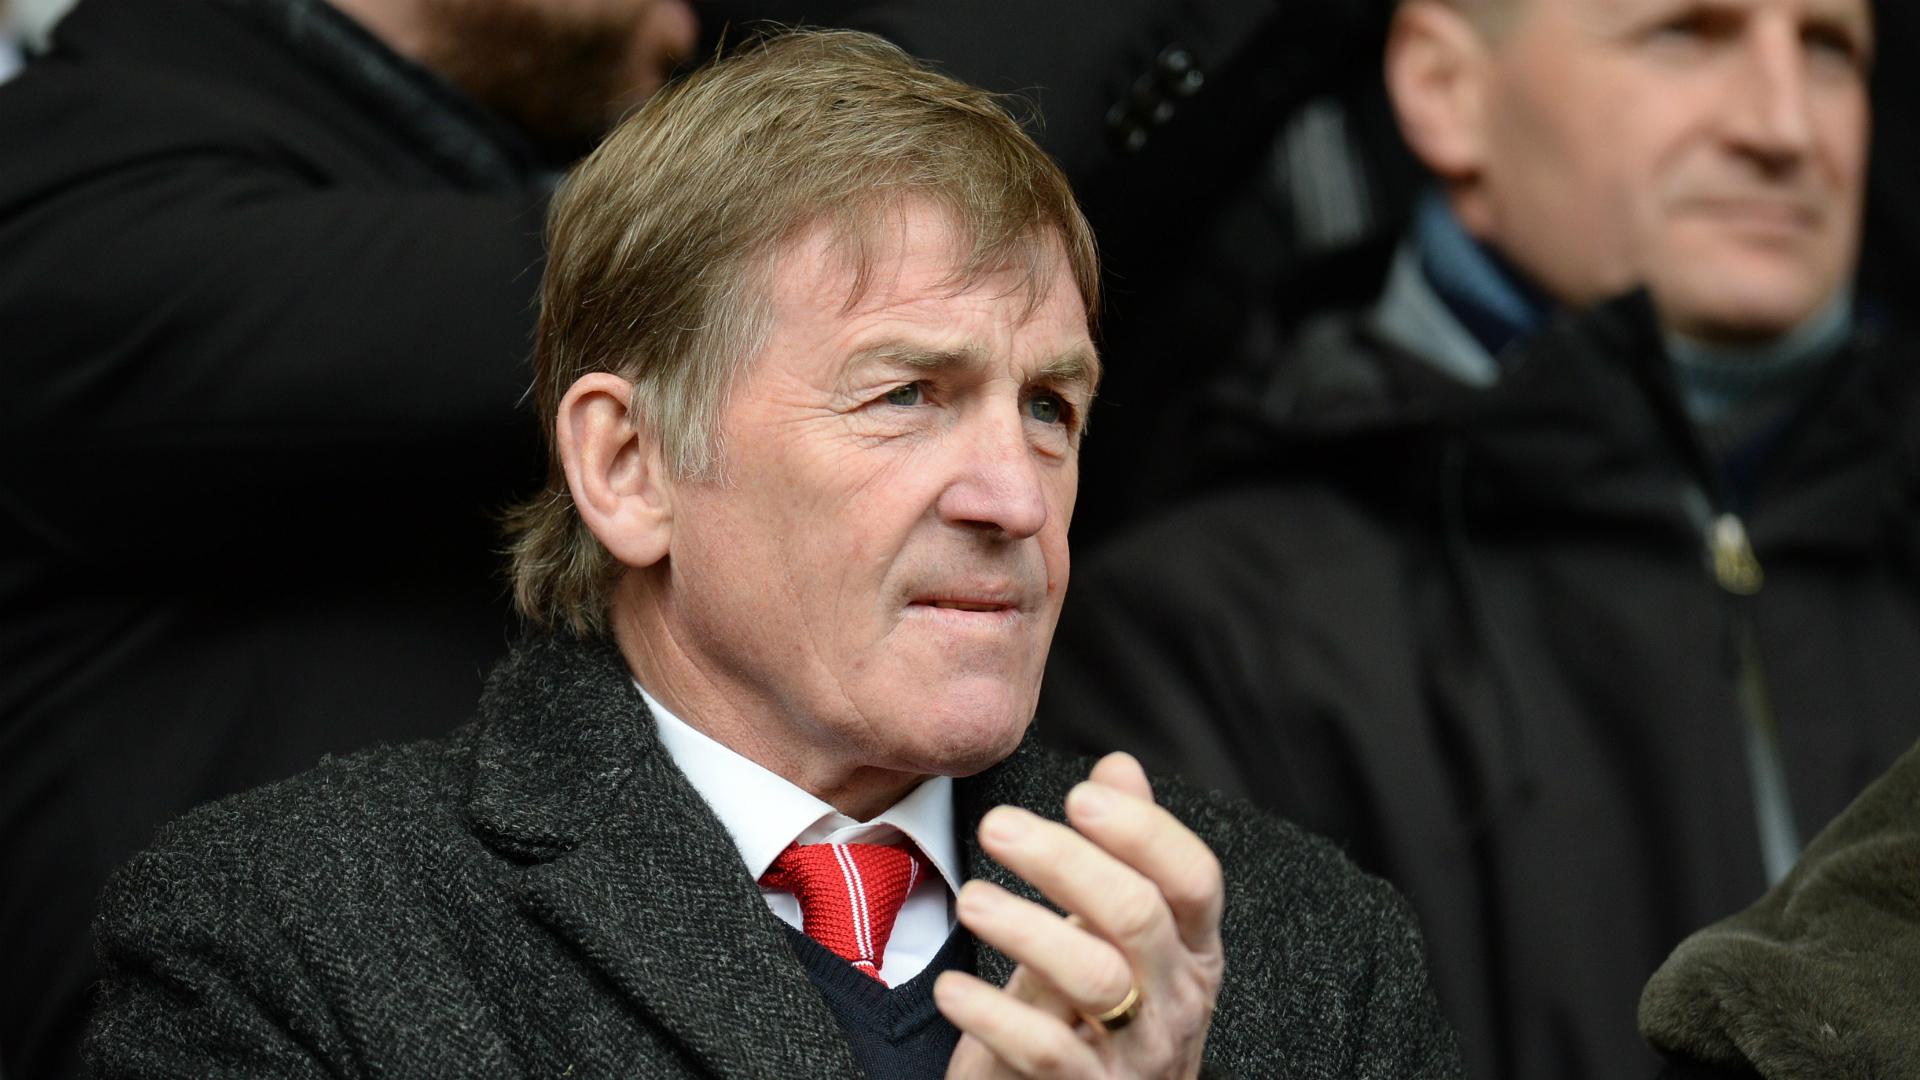 Liverpool legend Kenny Dalglish knighted